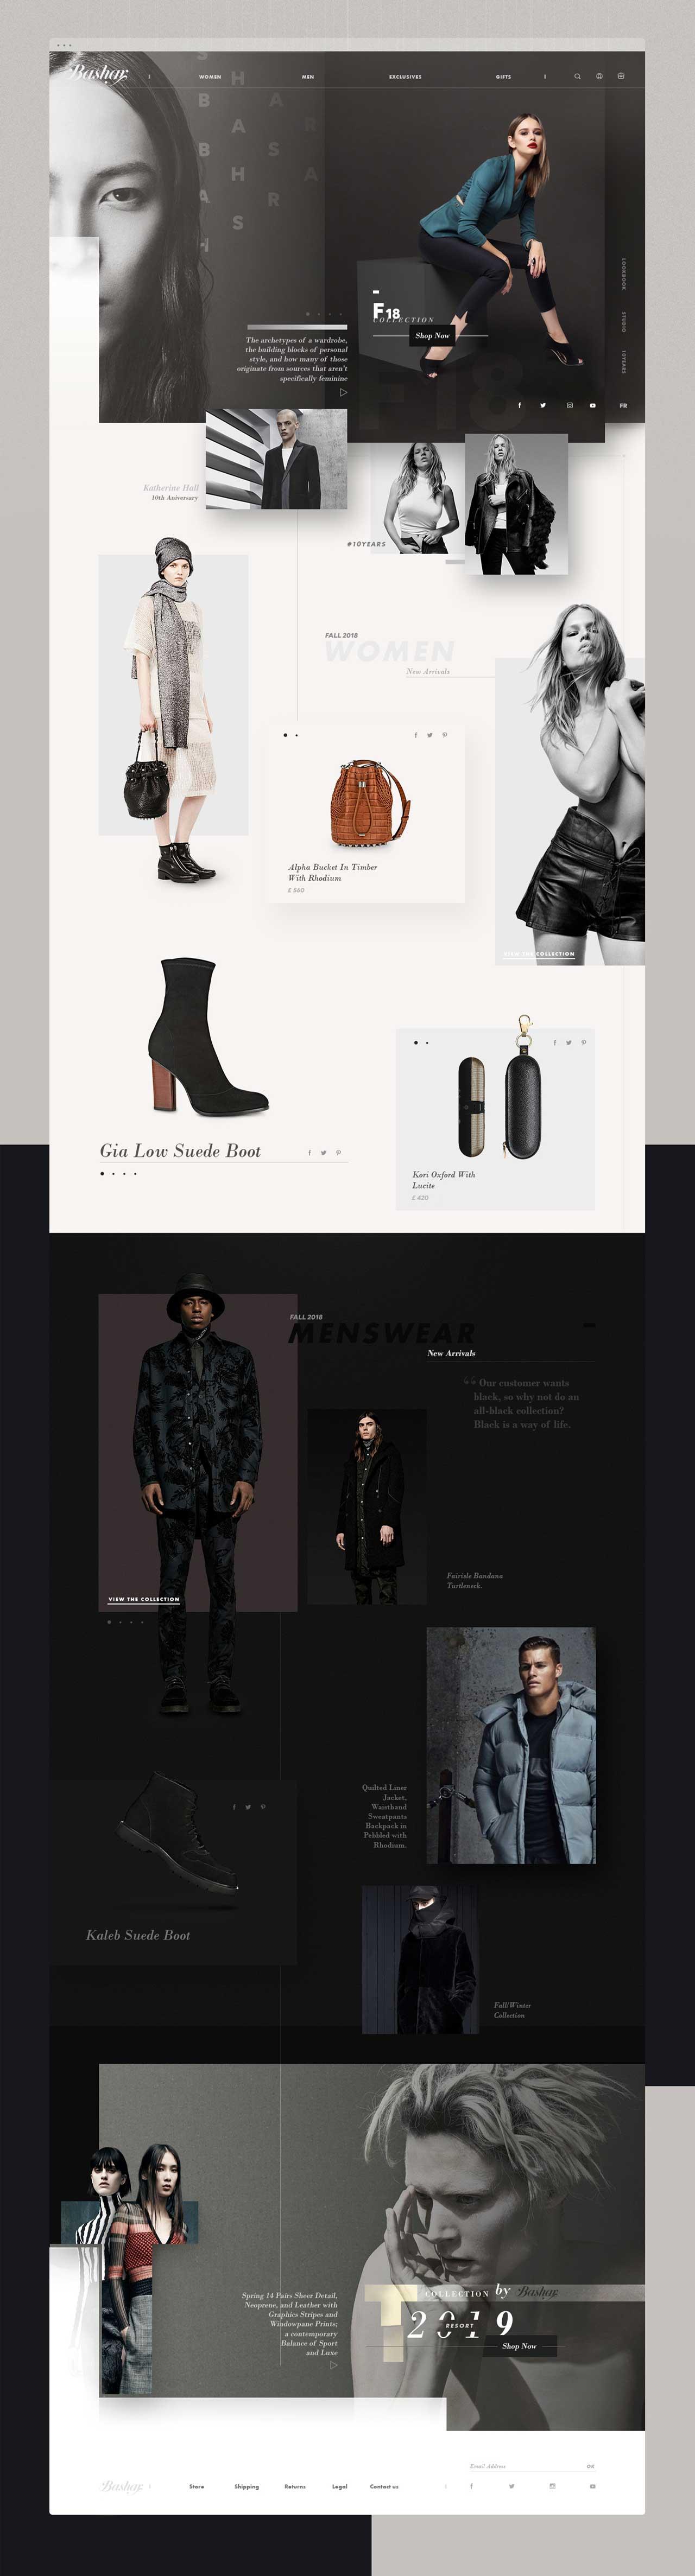 a web page view